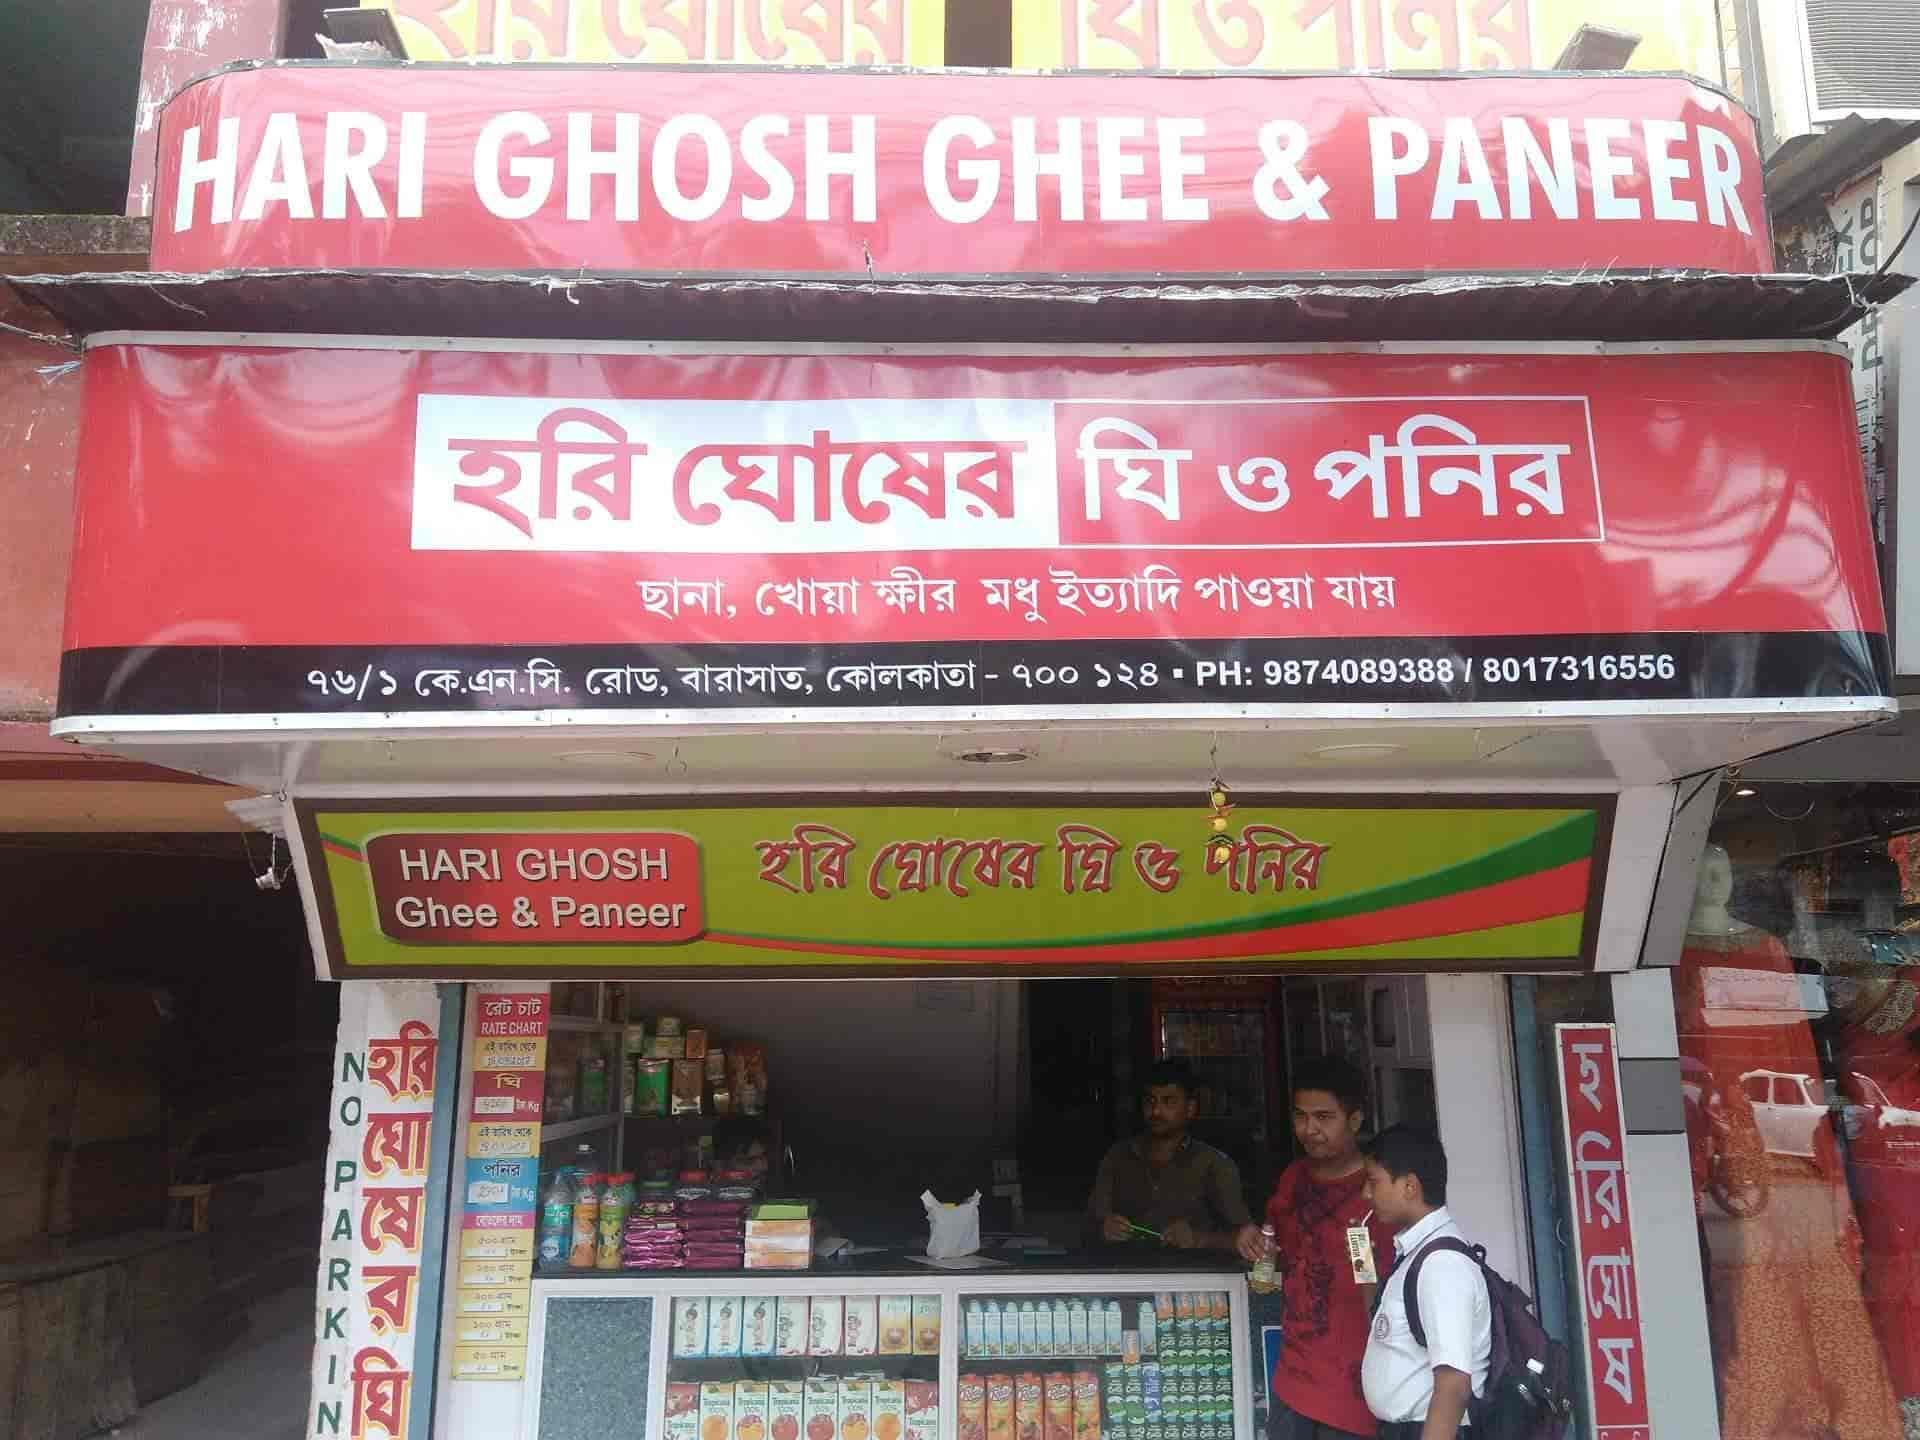 Hari Ghosher Ghee and Paneer, Barasat - Dairy Product Retailers in